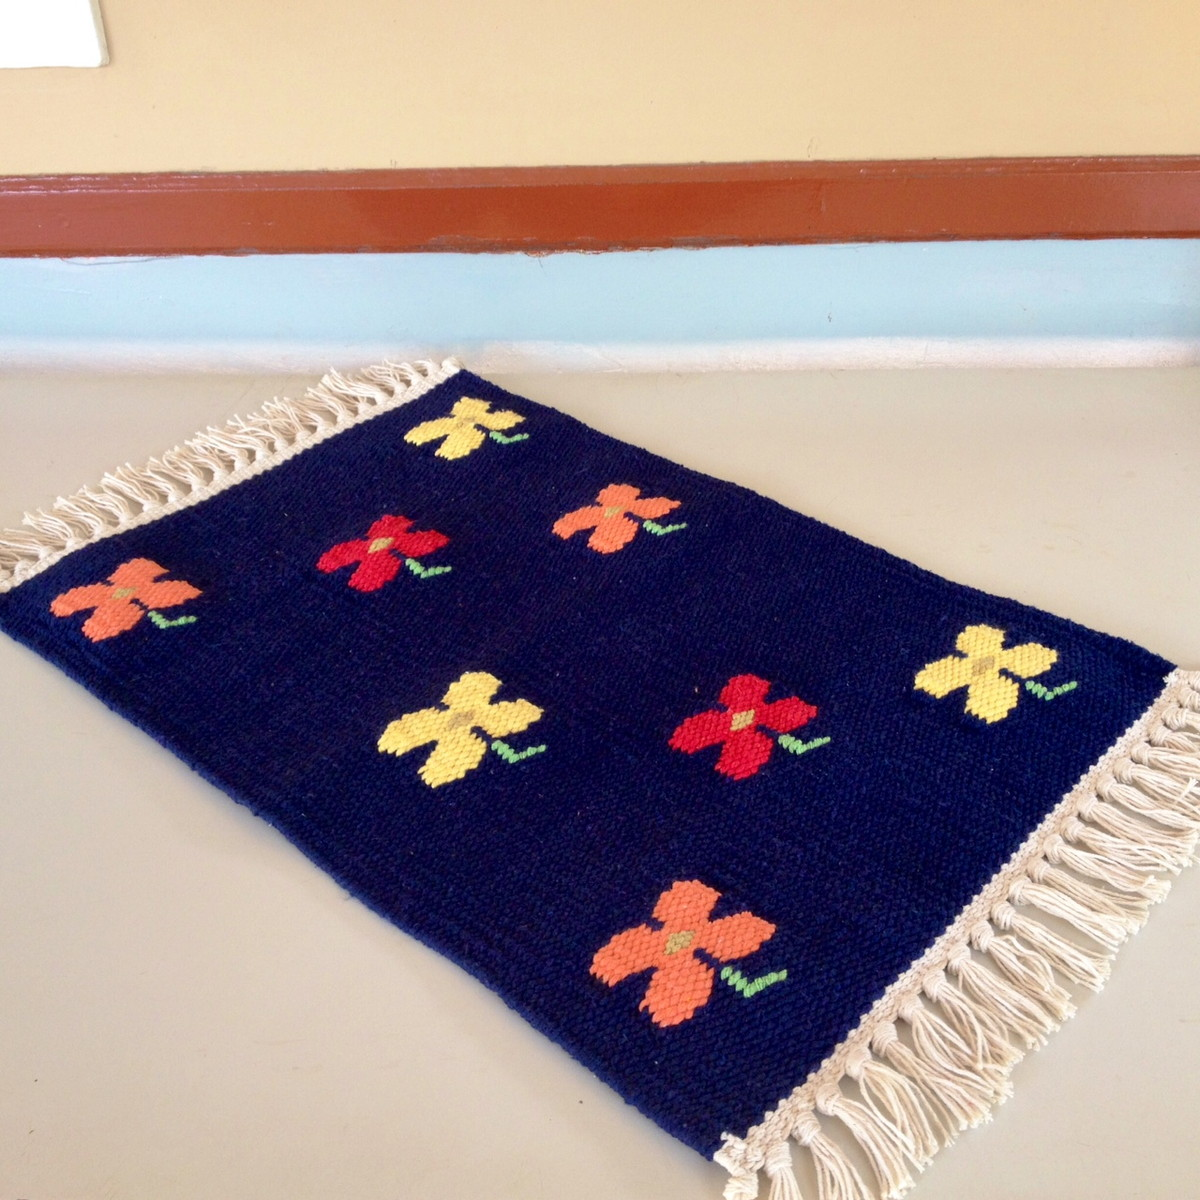 Tapete floral azul marinho lucotinha elo7 for Tapete floral